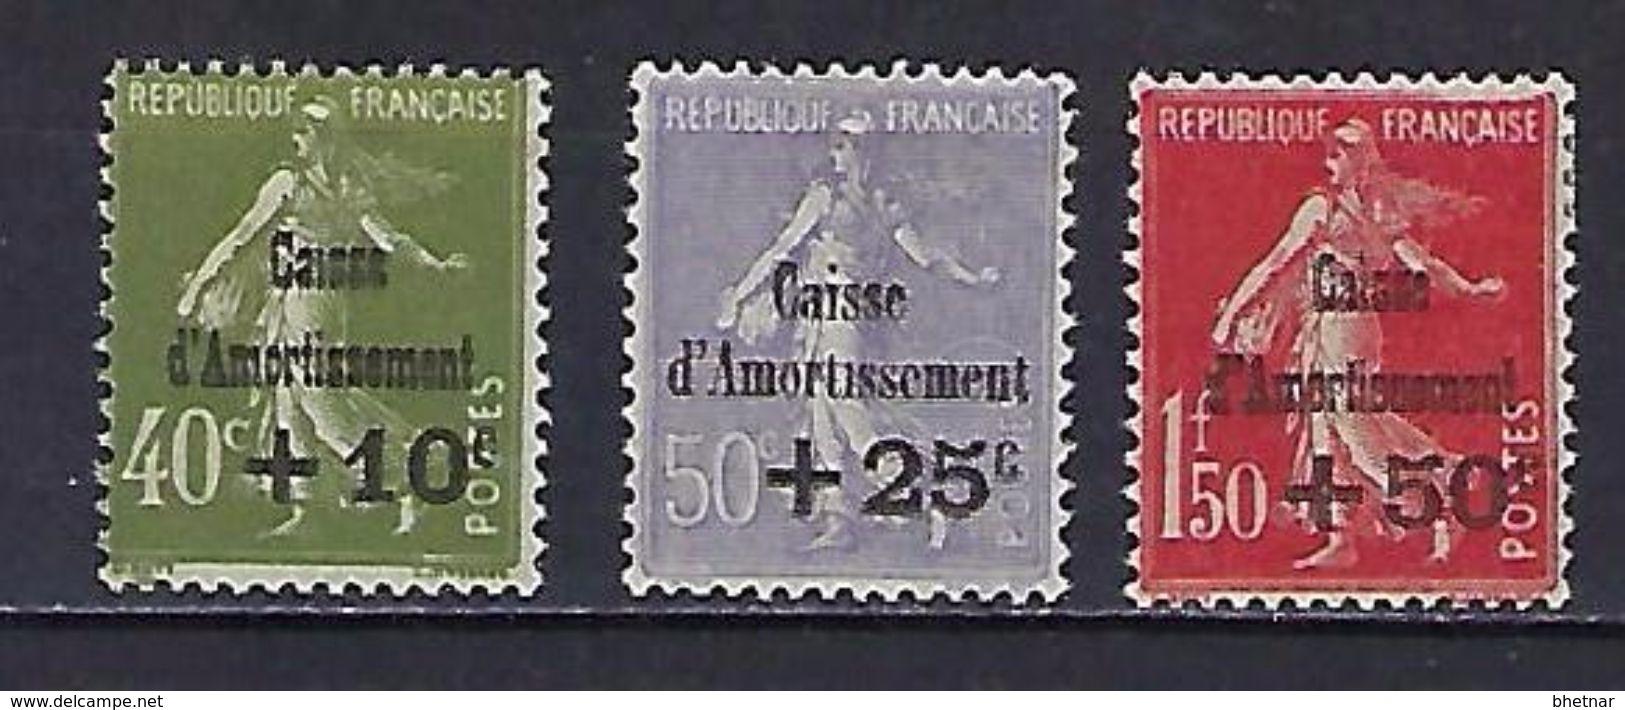 "FR YT 275 à 277 "" Série Caisse Amortissemment "" 1931 Neuf* - Sinking Fund"